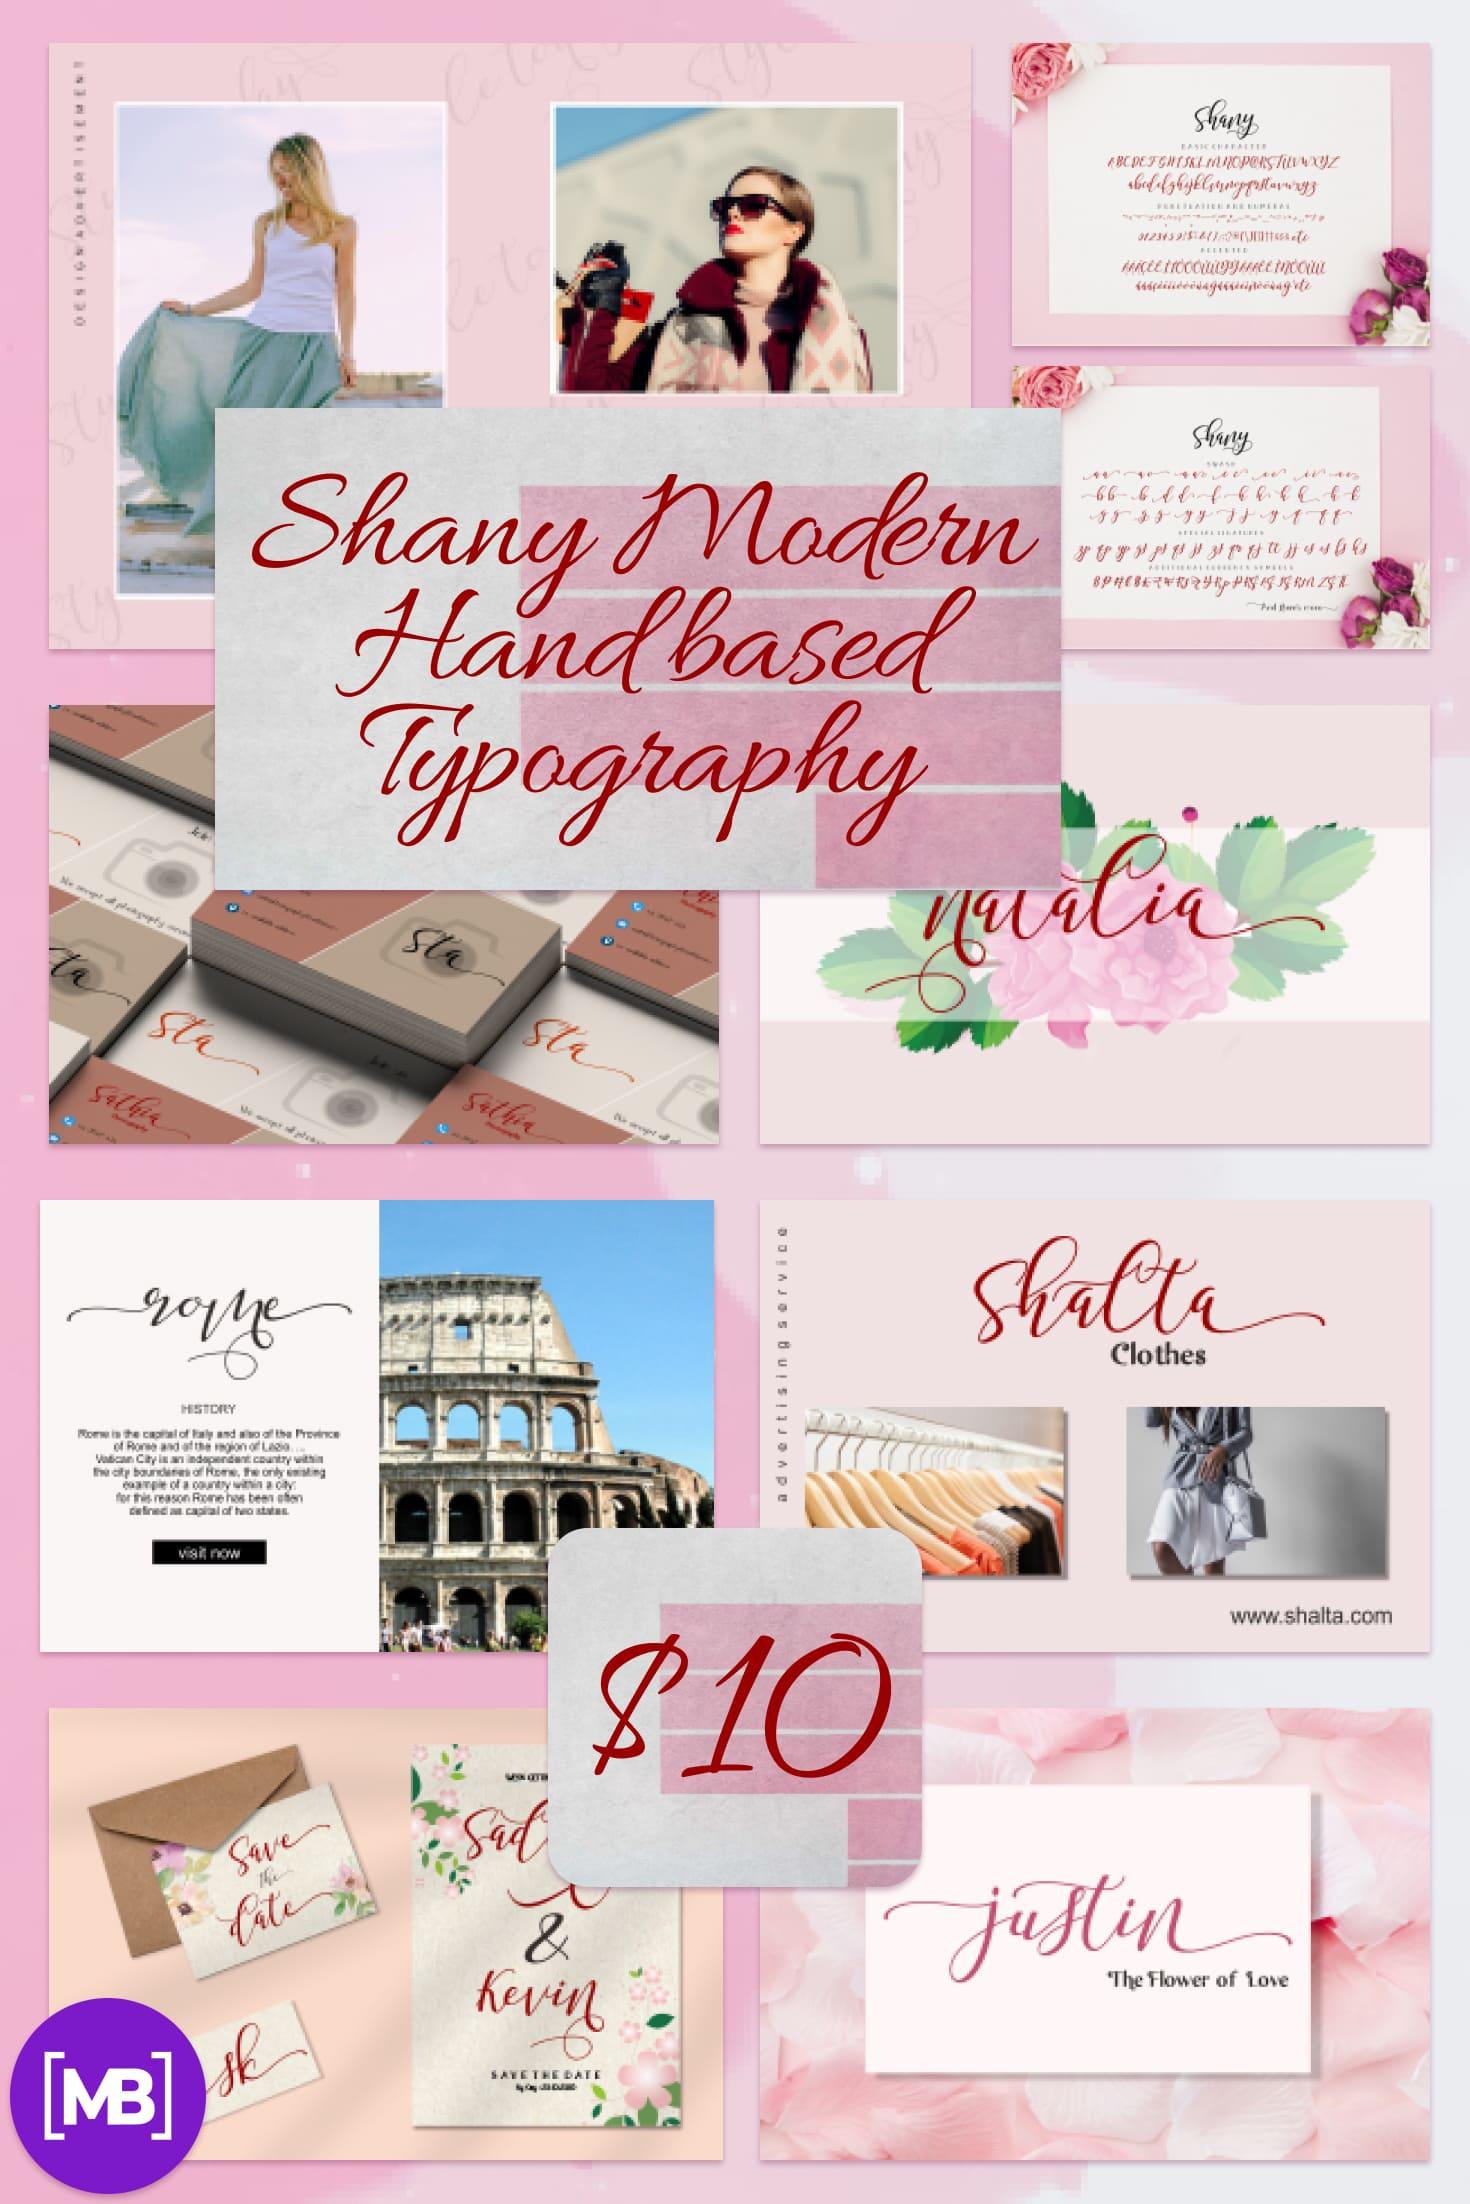 Pinterest Image: Shany Modern Hand based Typography.